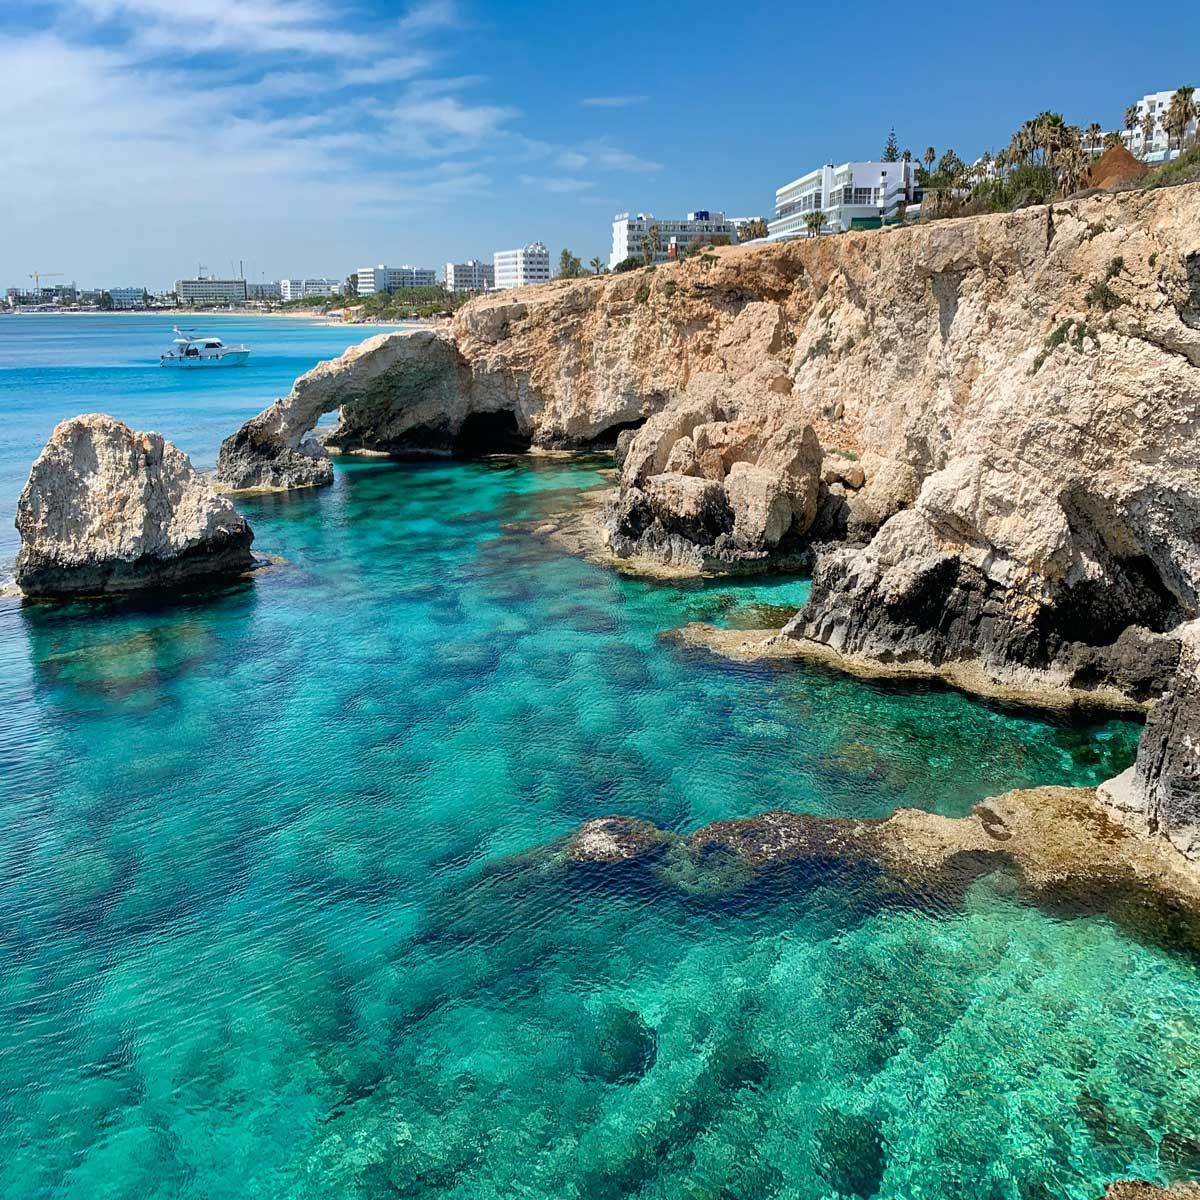 The vivid blue waters of Ayia Napa beach in Cyprus.